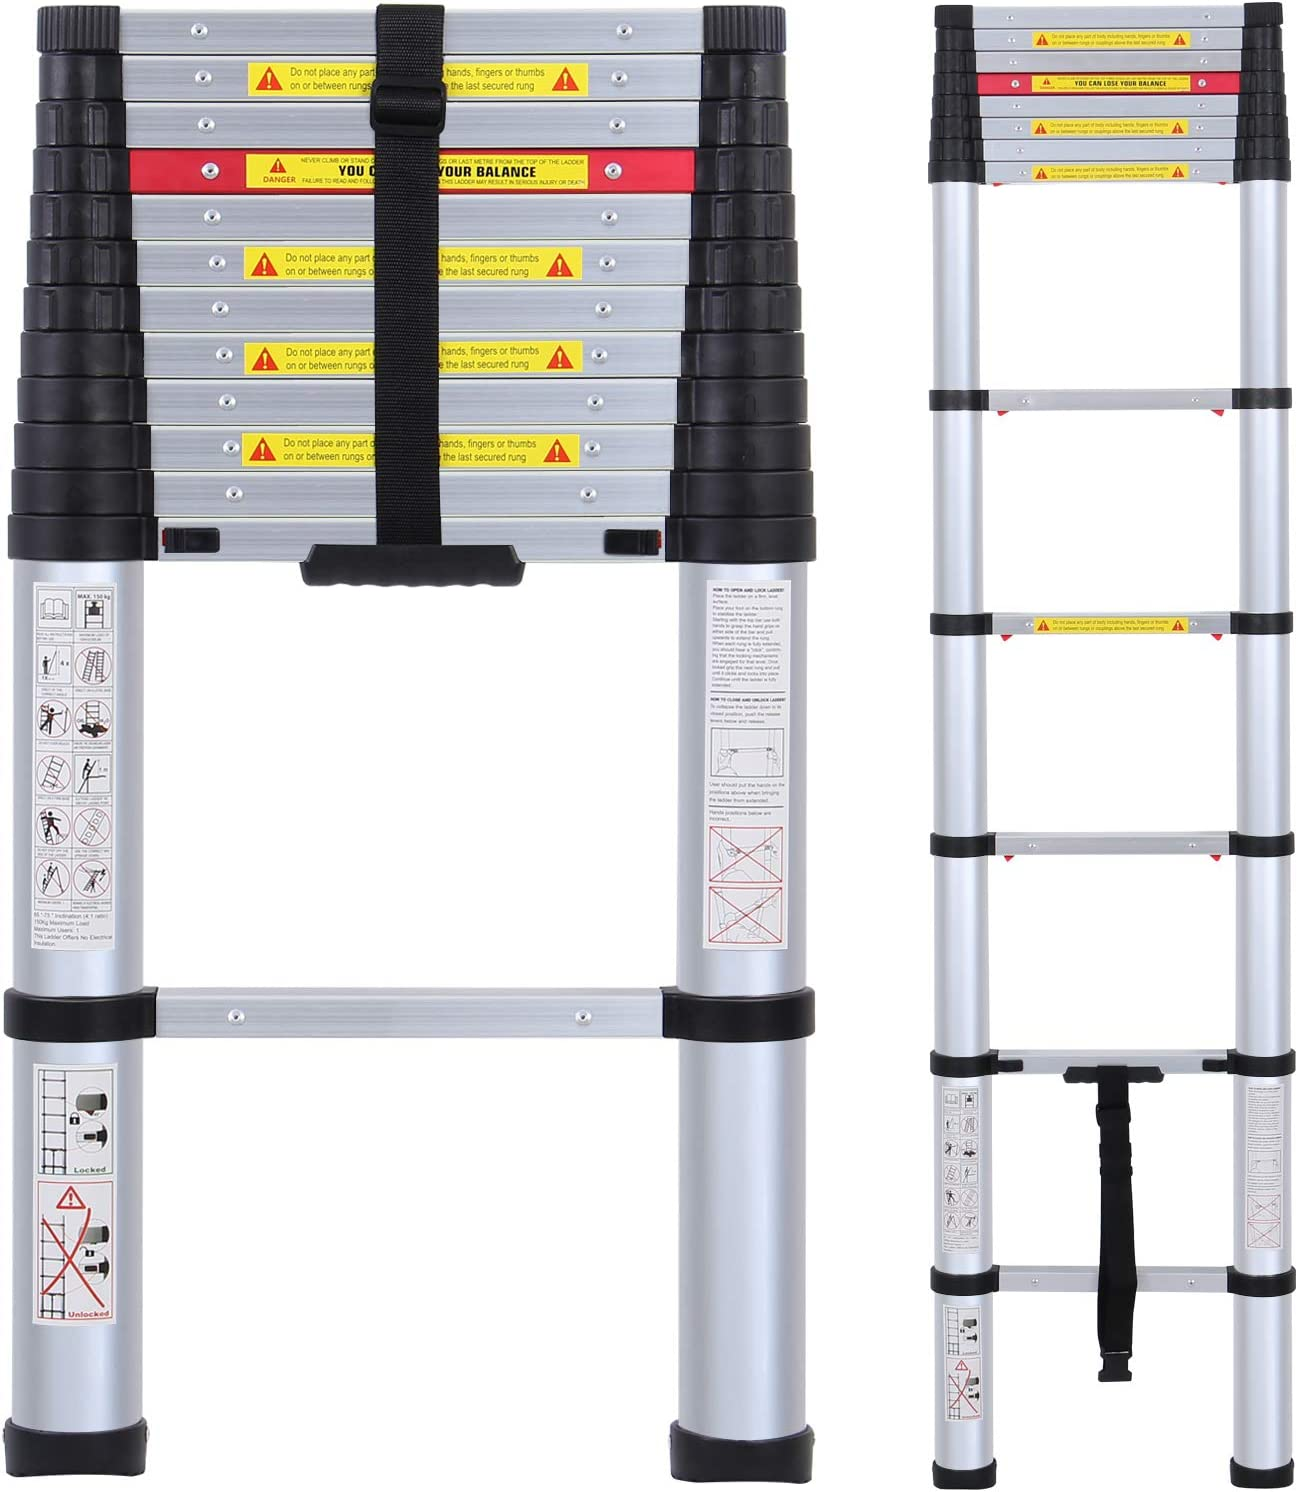 Aluminum Telescoping Extension Ladder Telescopic Ladder Multi Purpose Ladder 8.5 Feet 330 Pound Capacity